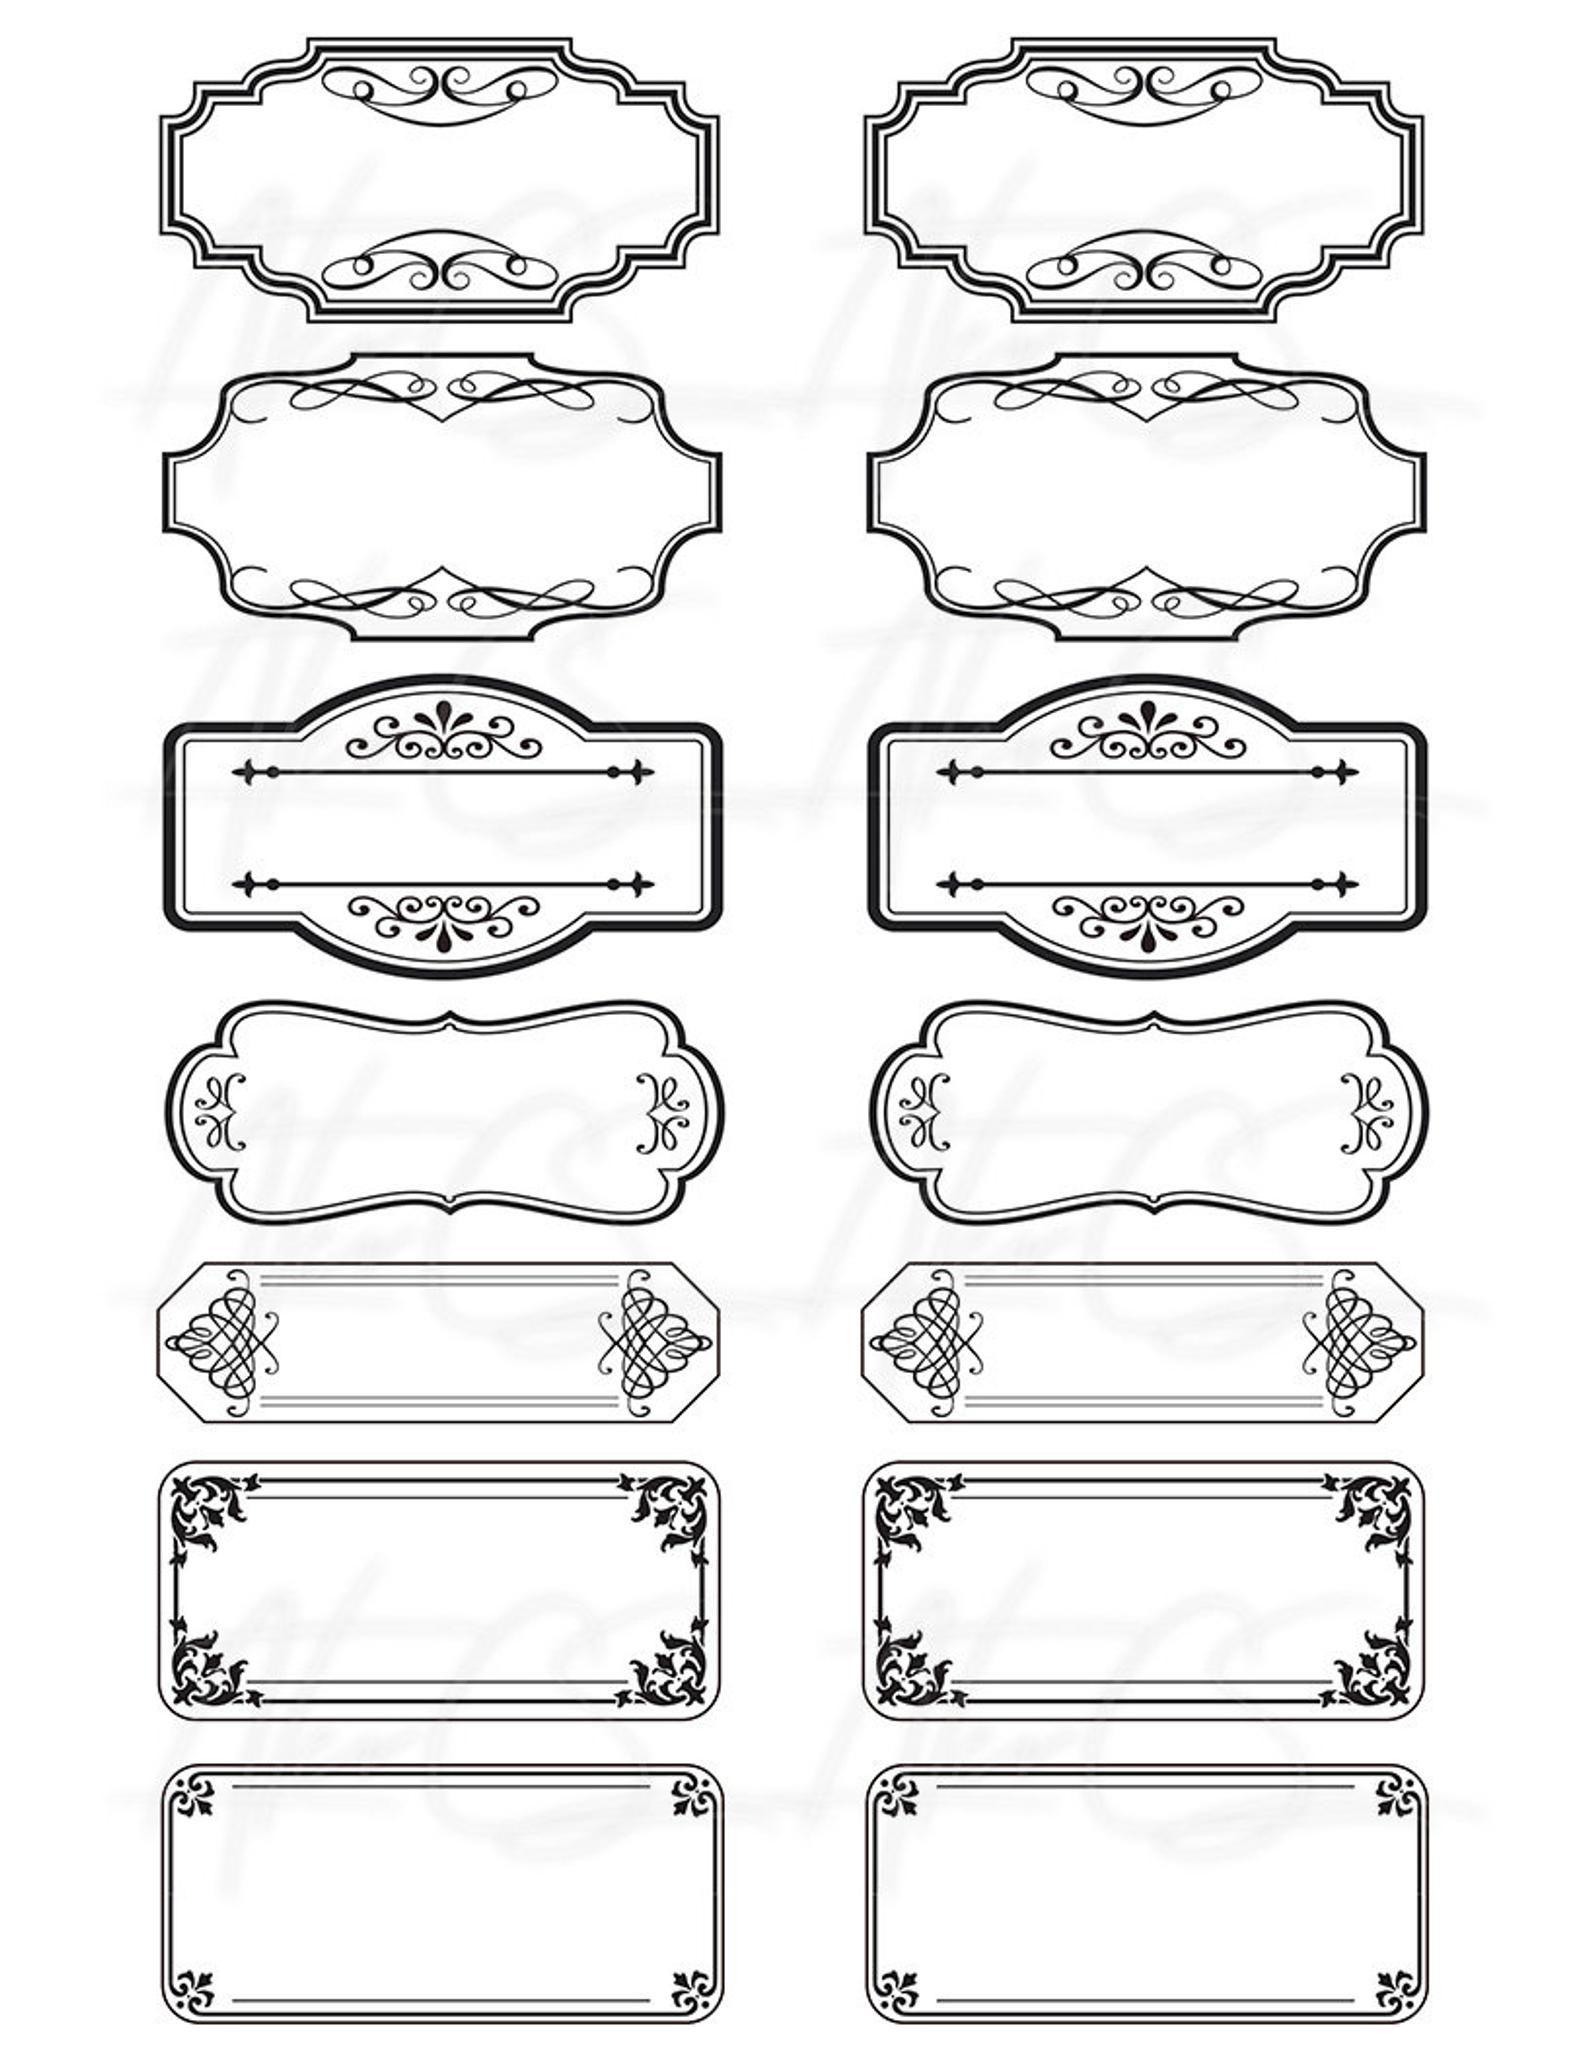 15 Printable Blank Vintage Apothecary Labels Set, Editable PDF, Scrapbooking Ephemera, Journal Junk, Collage Sheet, Digital Download